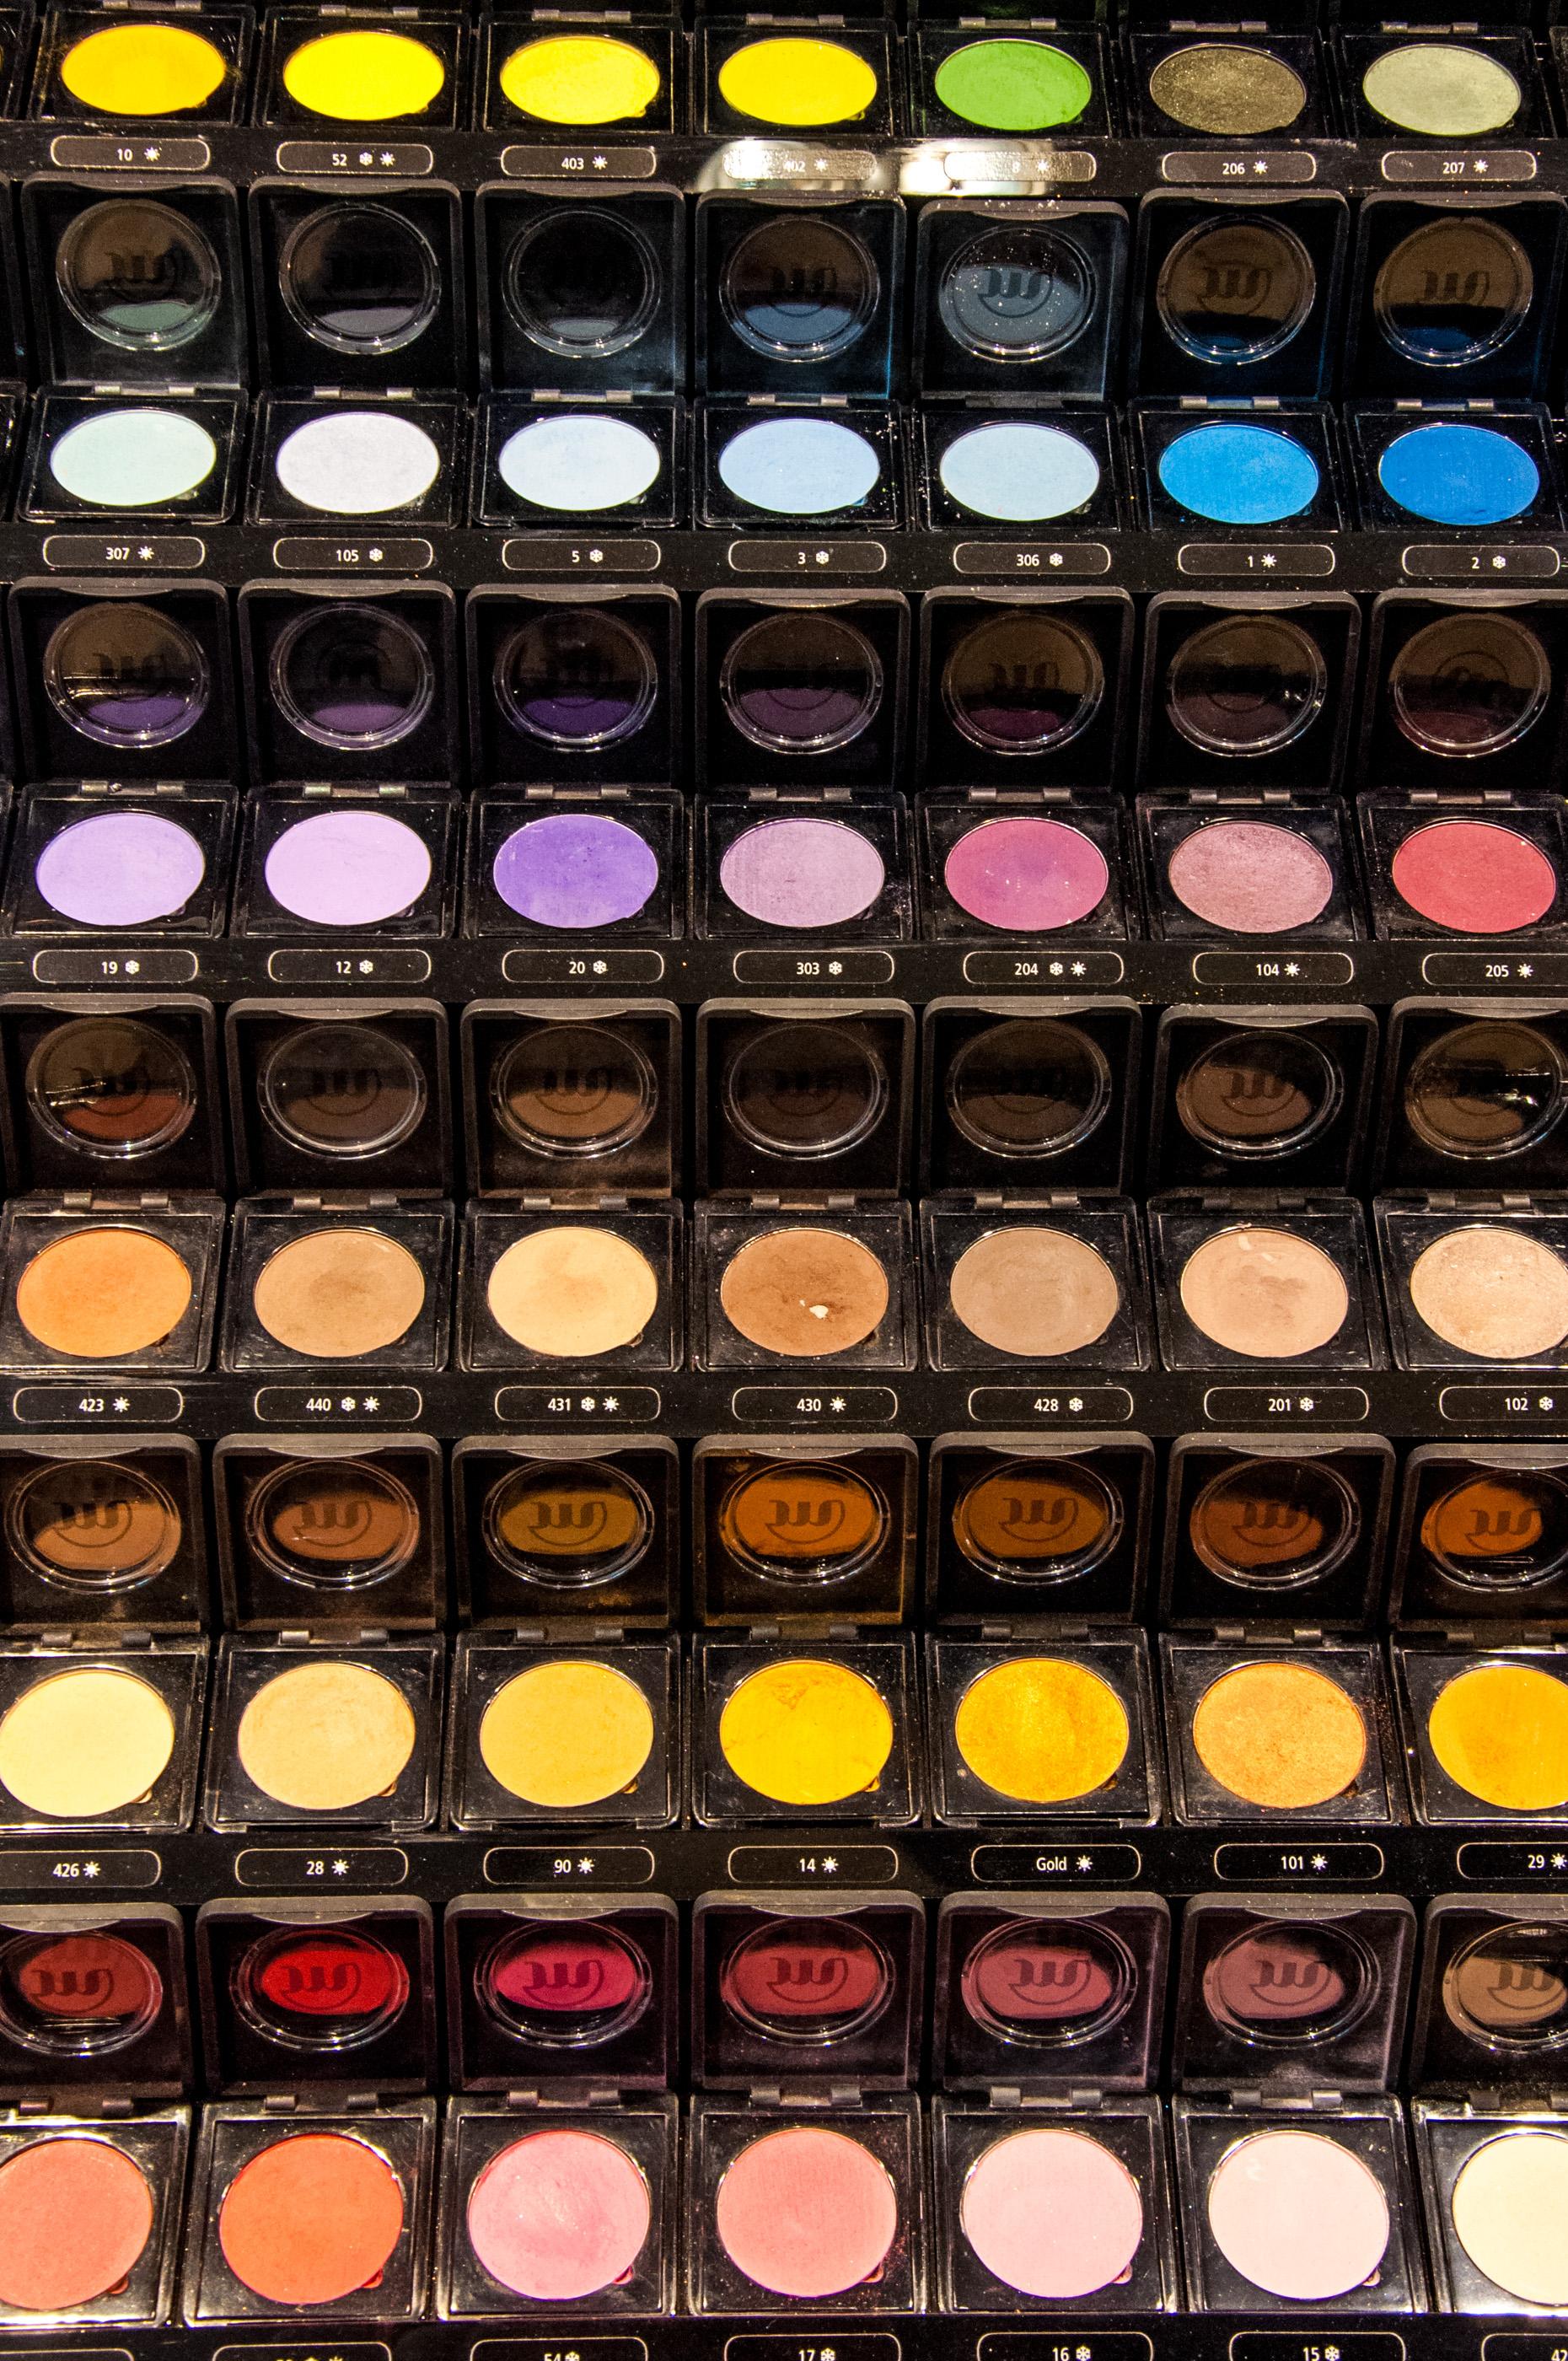 Eye make up cosmetics  display, Above, Pampering, Makeup, Mirror, HQ Photo